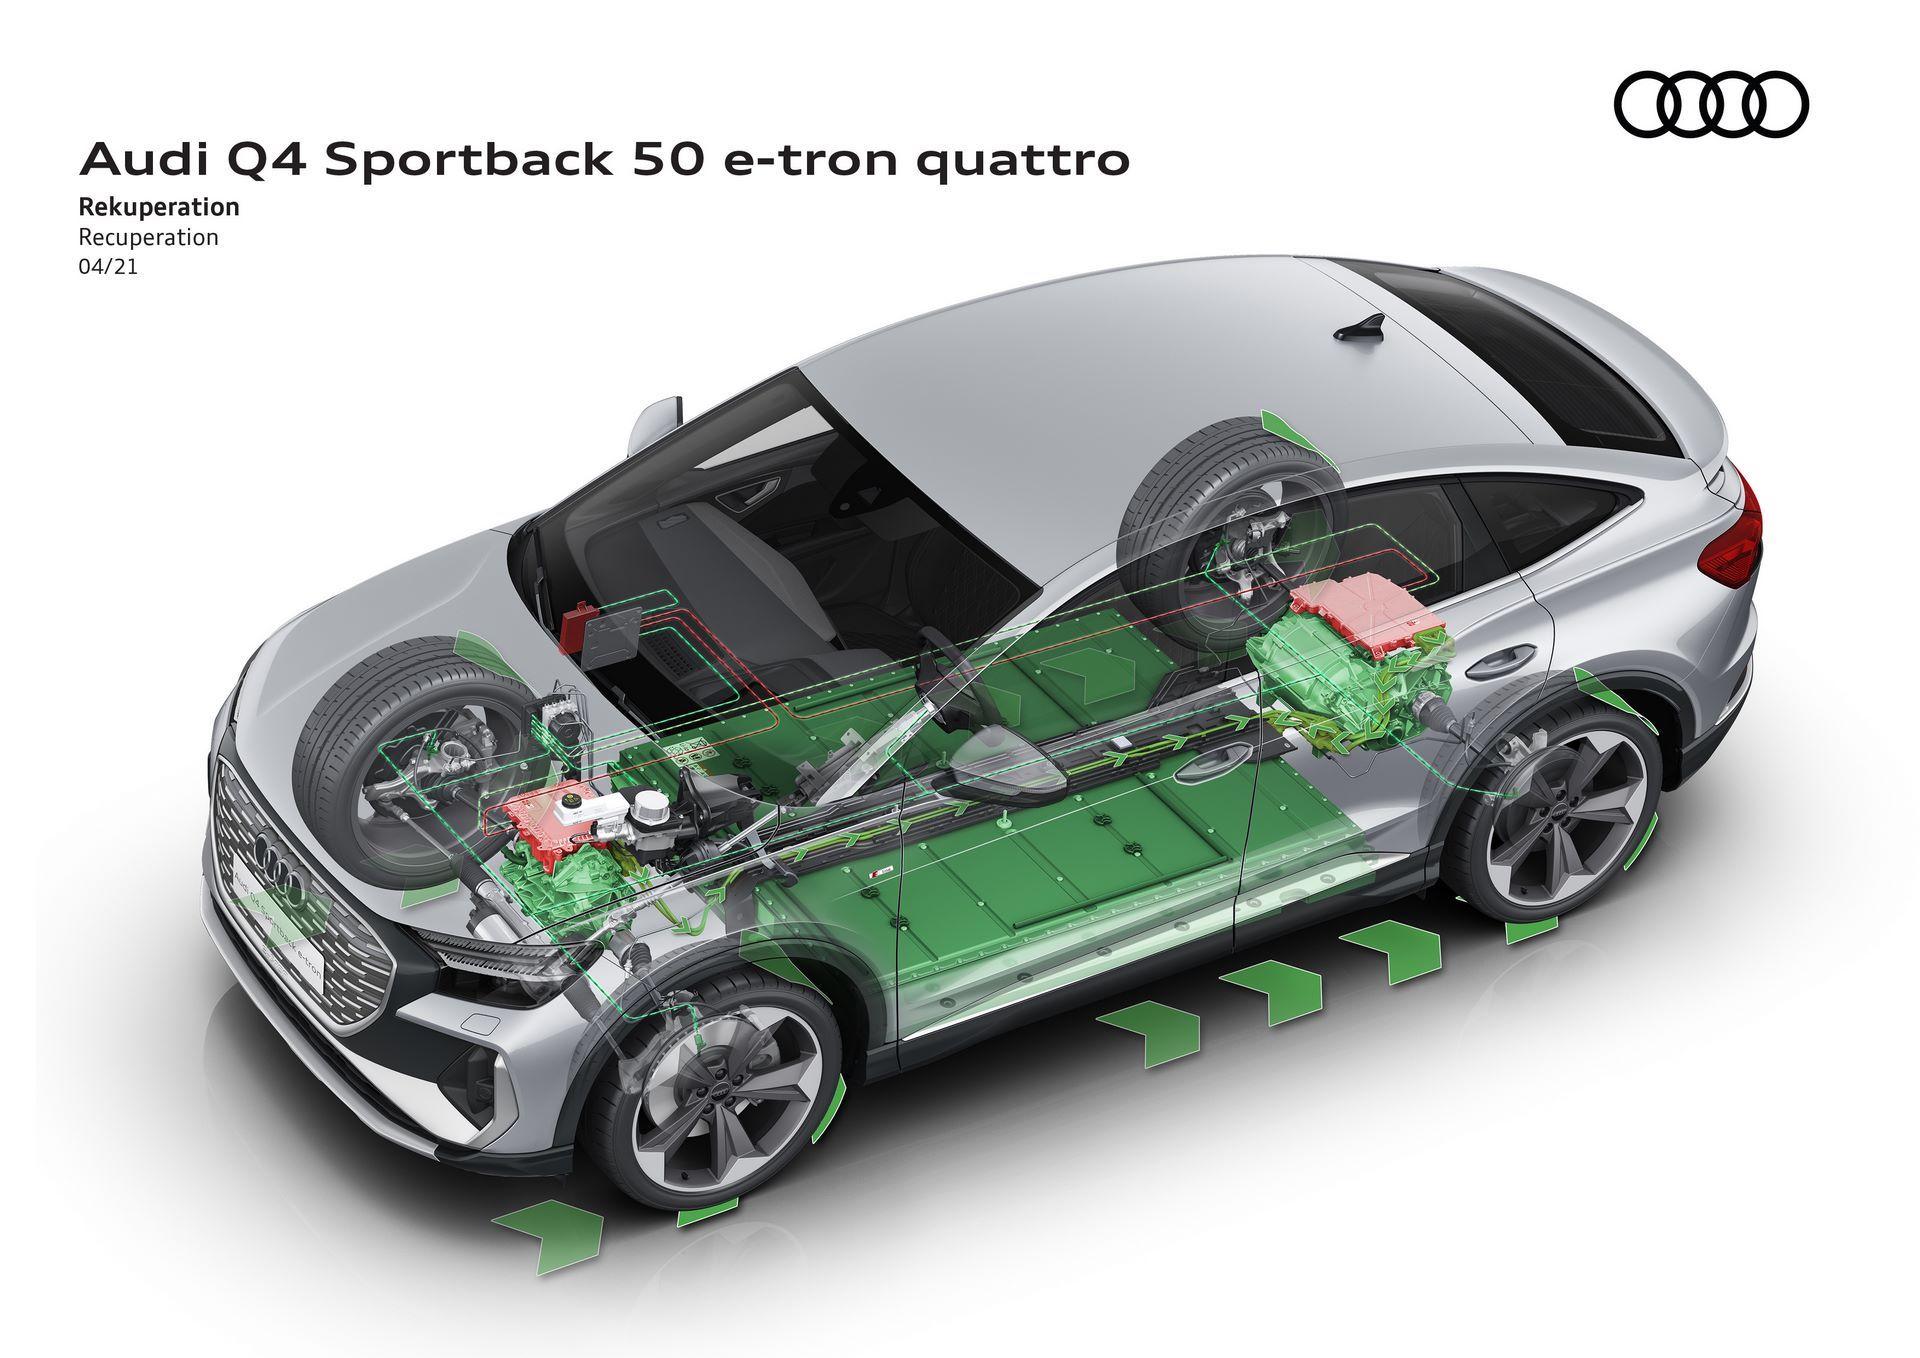 Audi-Q4-e-tron-and-Q4-e-tron-Sportback-151